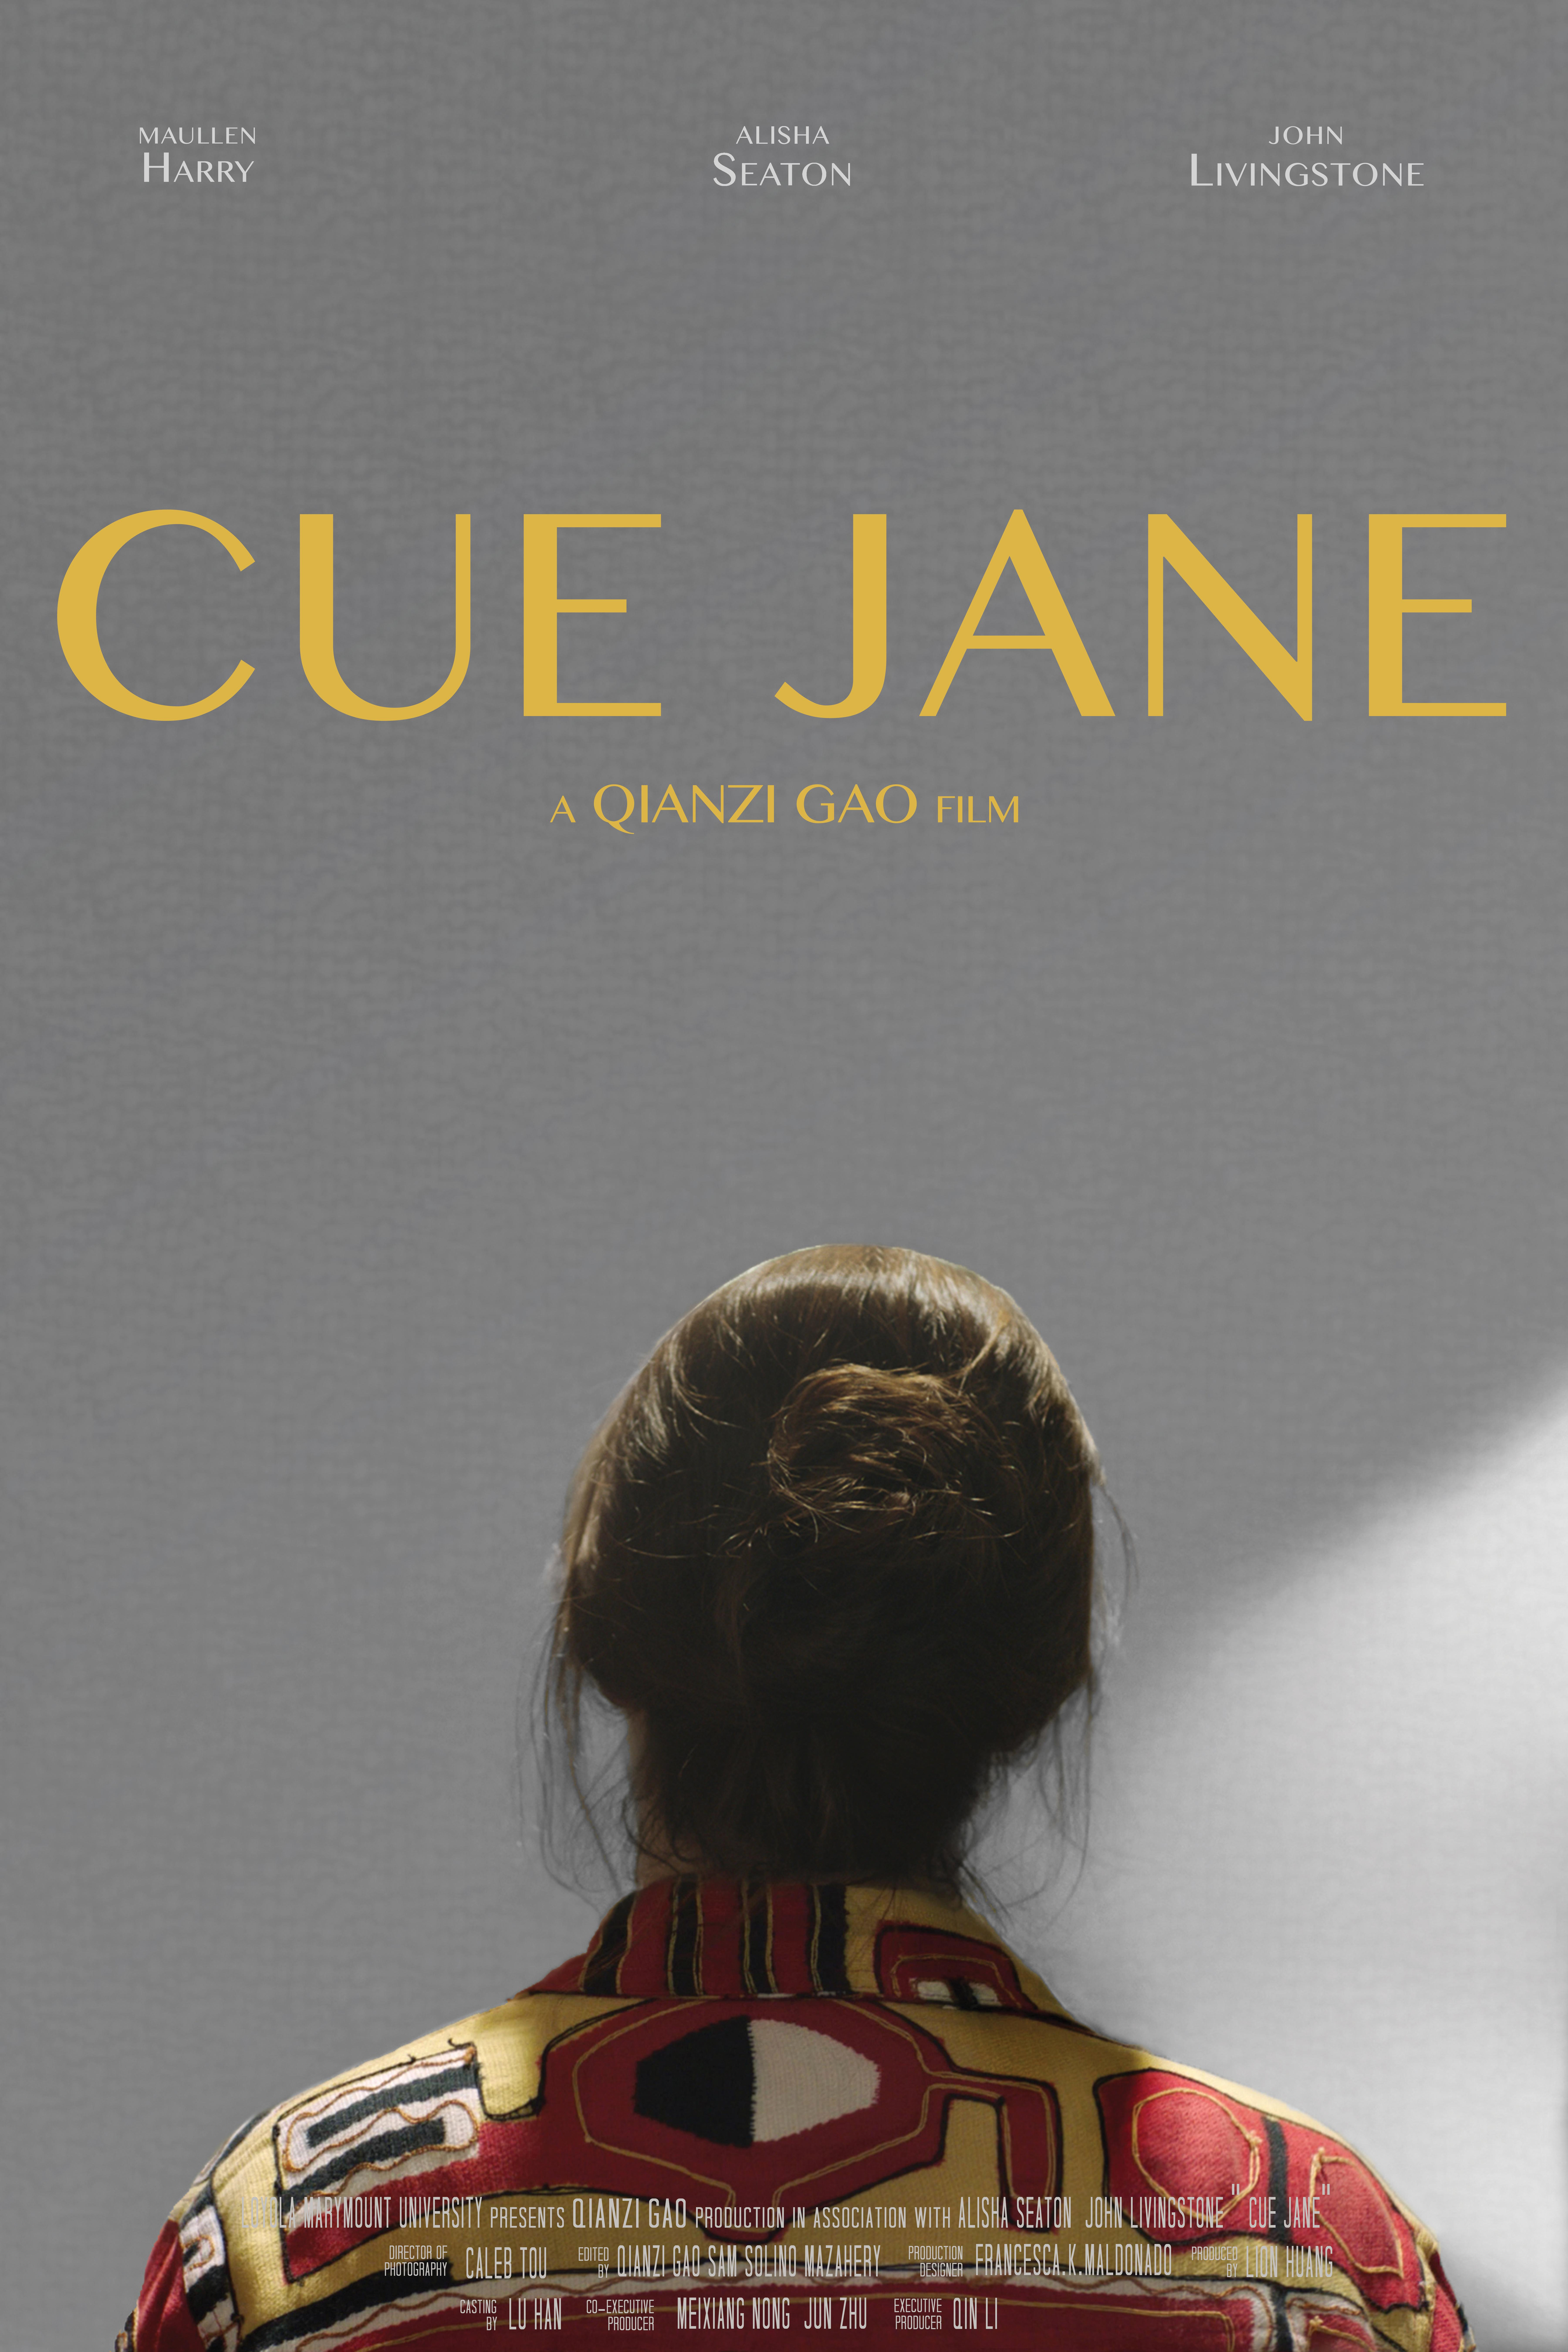 Cue Jane